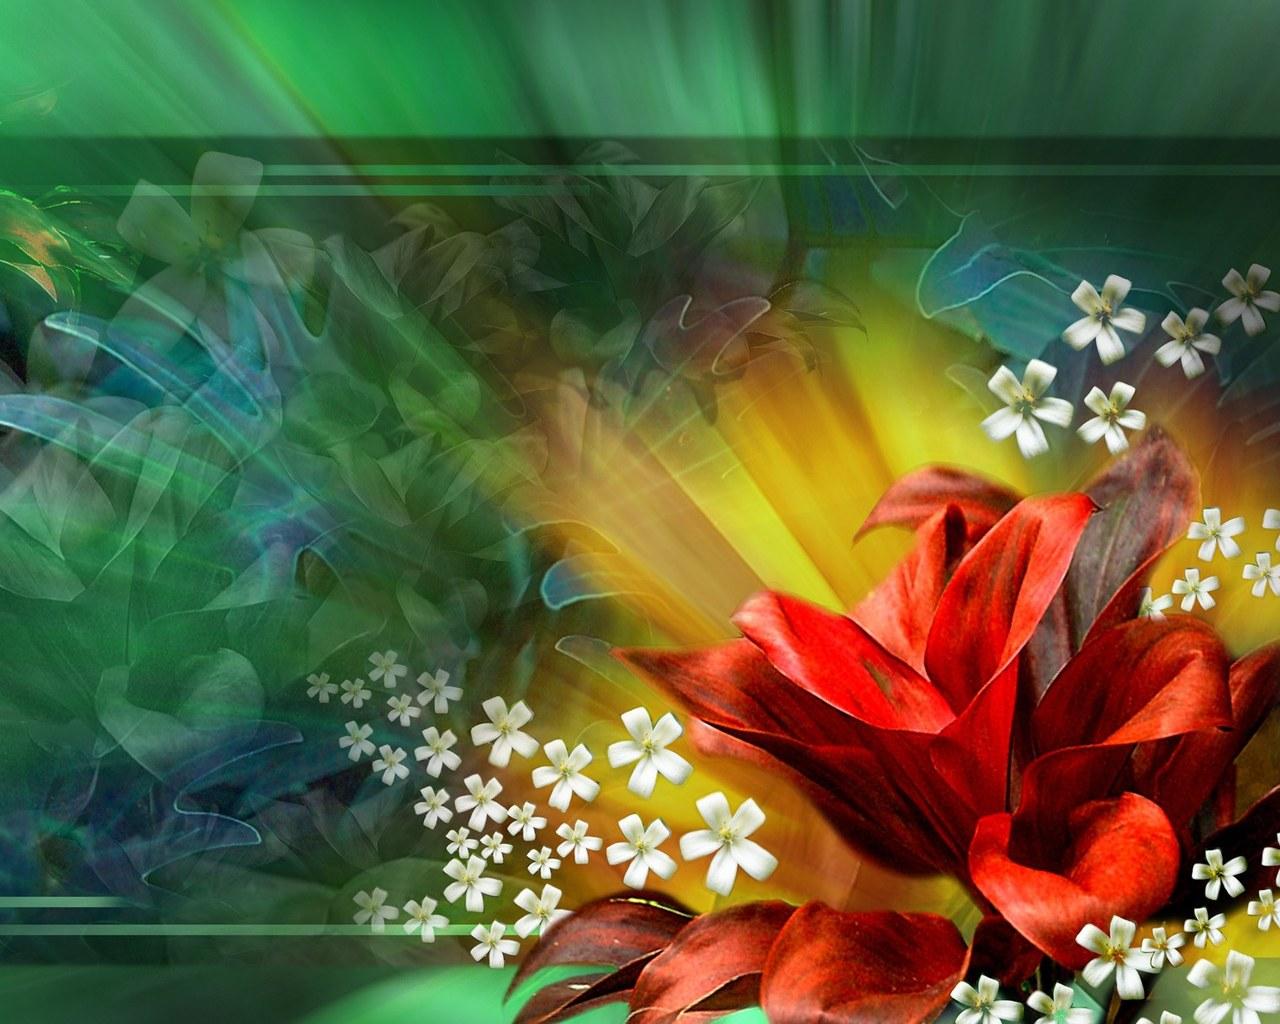 http://3.bp.blogspot.com/-m3q9-TU-J1c/TxpbY_vBNqI/AAAAAAAAAbM/vQ1ge-VoqeY/s1600/free+animated+desktop+wallpaper.jpg